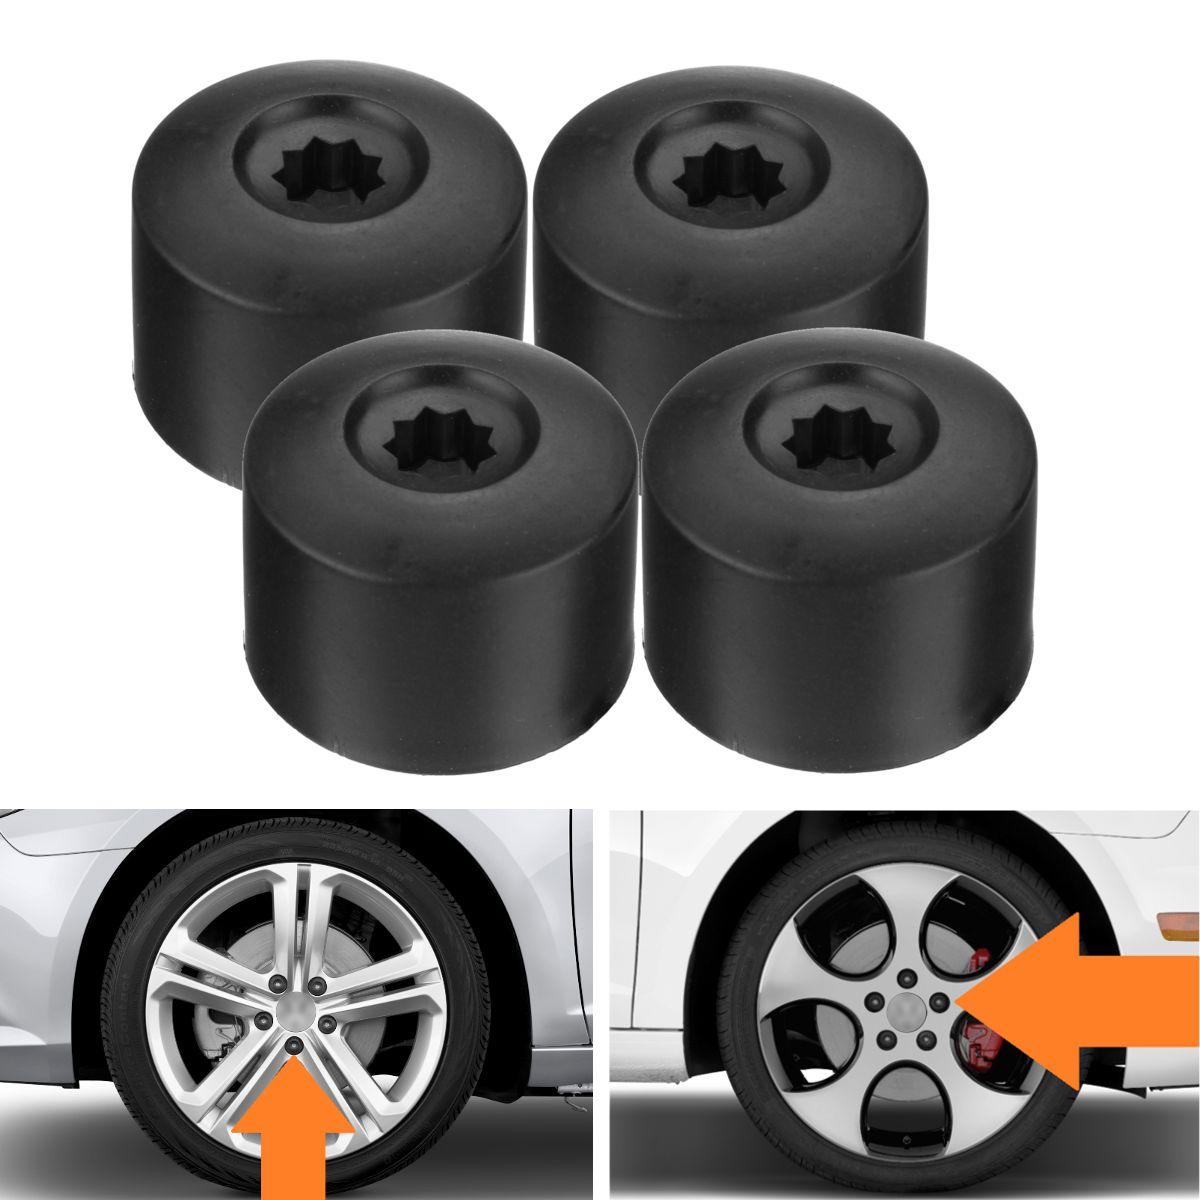 GENUINE 2011-2017 VW TOURAN 17MM 1X WHEEL BOLT NUT STUD FOR ALLOY STEEL WHEEL